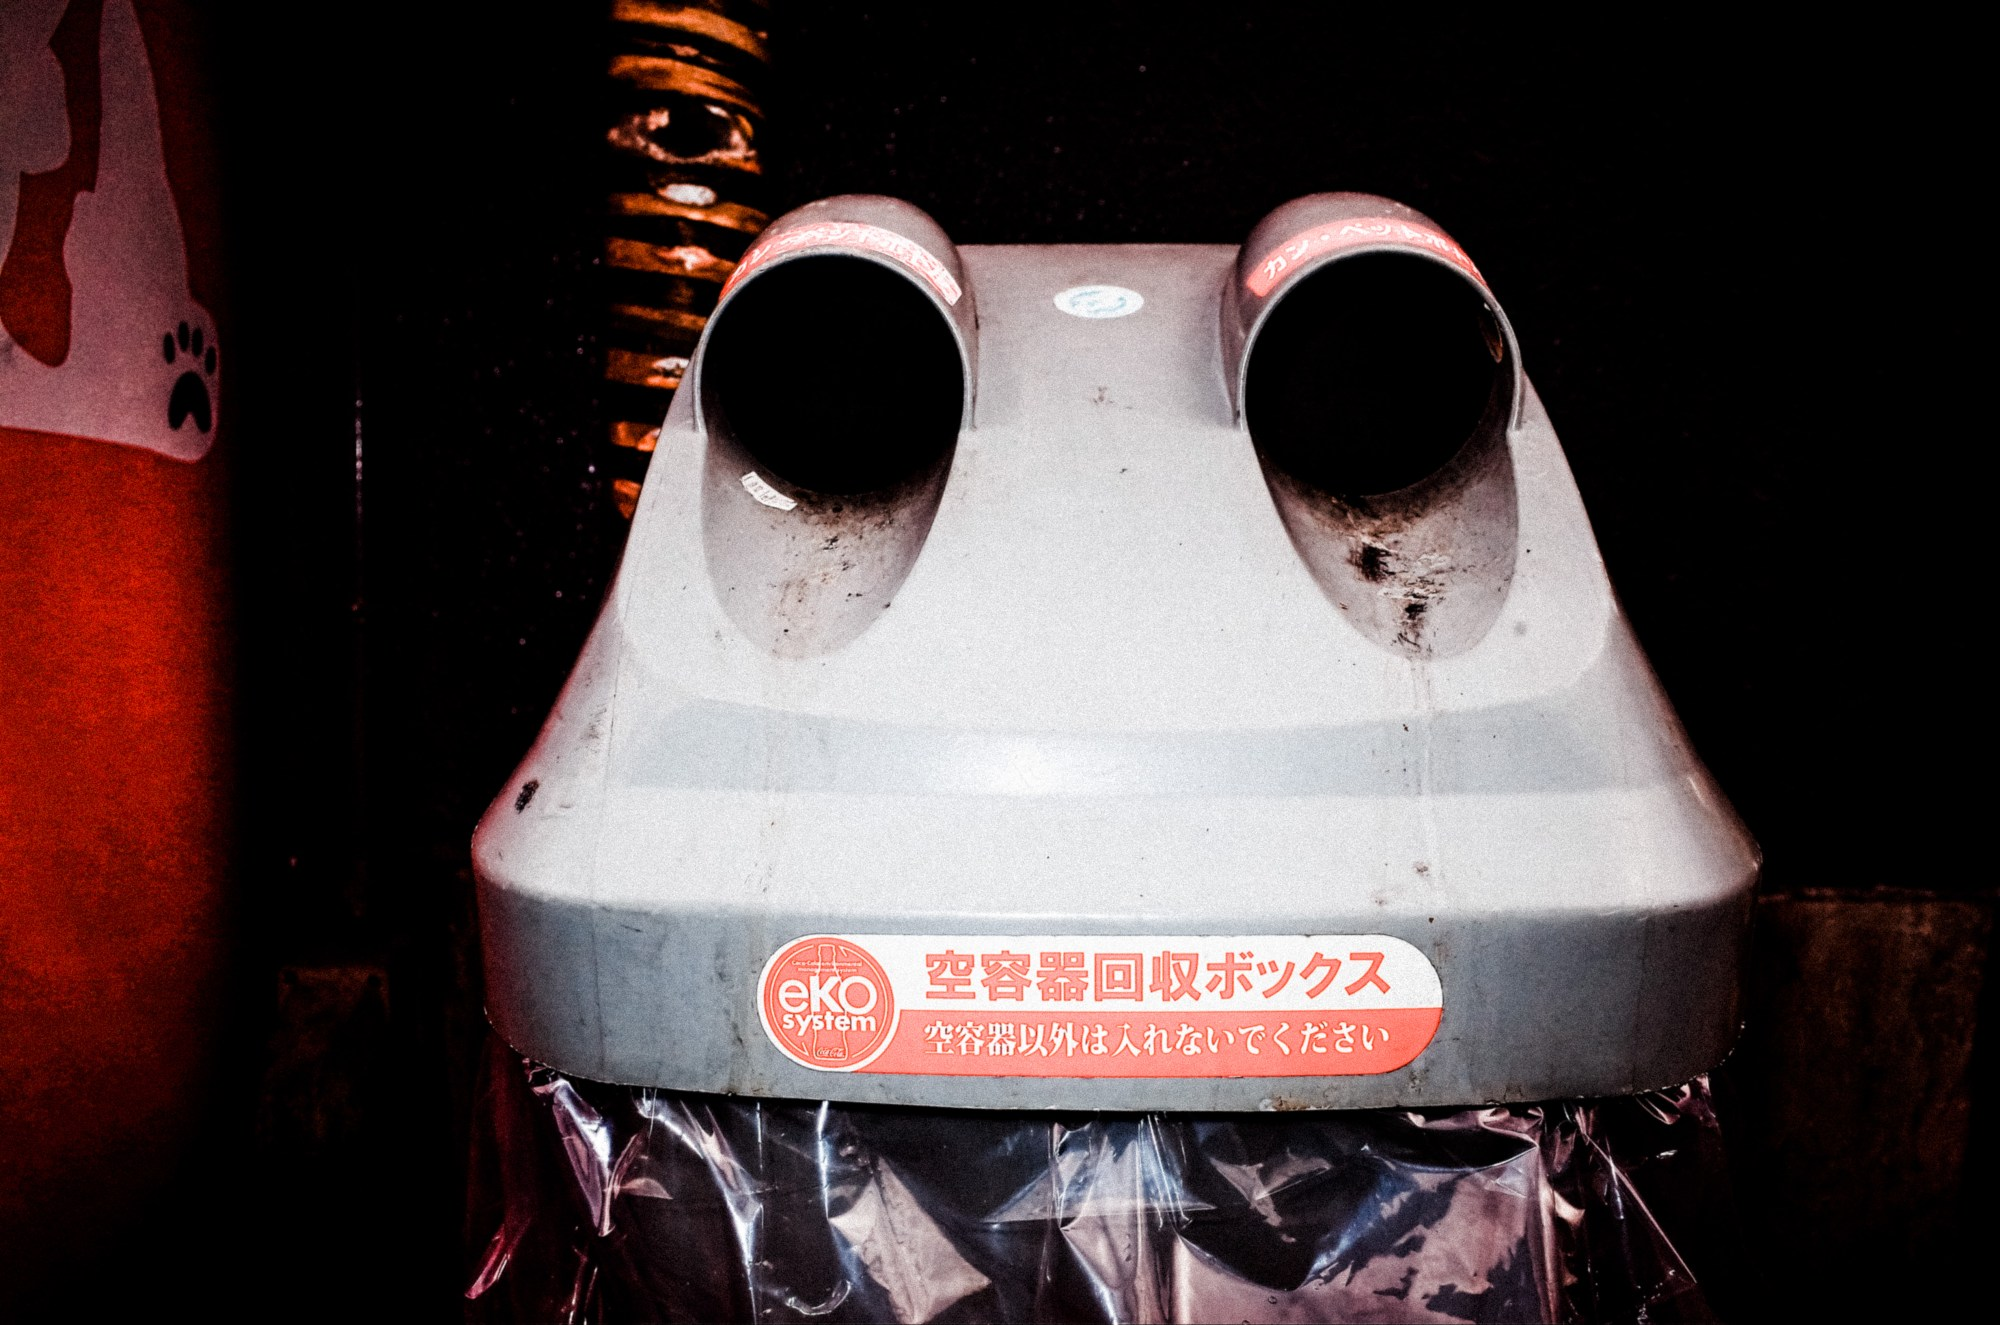 Frog garbage can. Tokyo, 2017